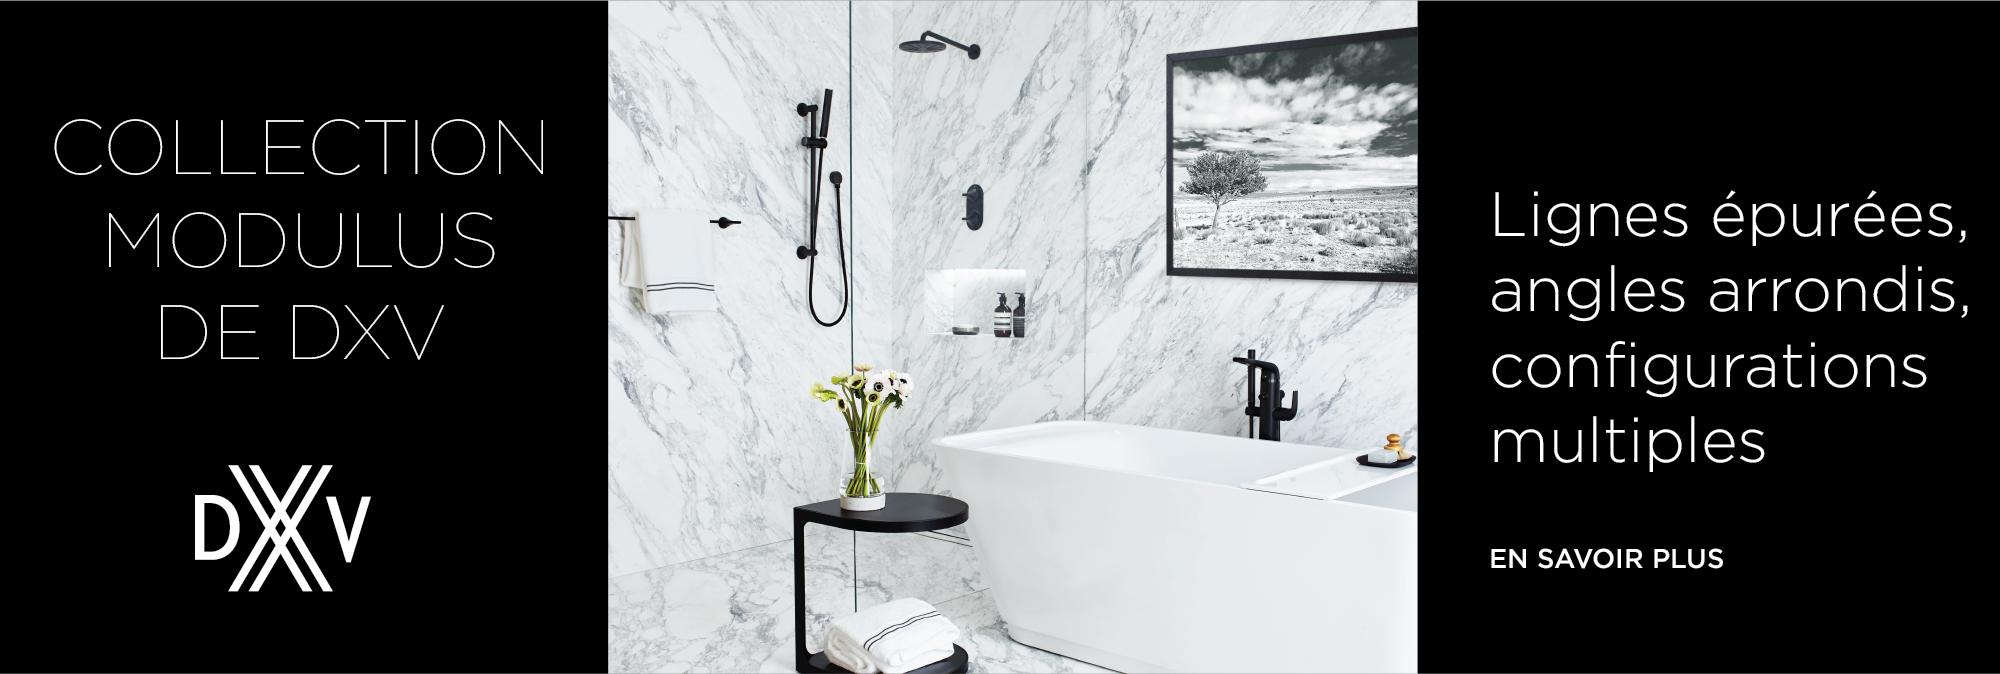 Vague & Vogue | Plumbing Fixtures, Faucets, Accessories